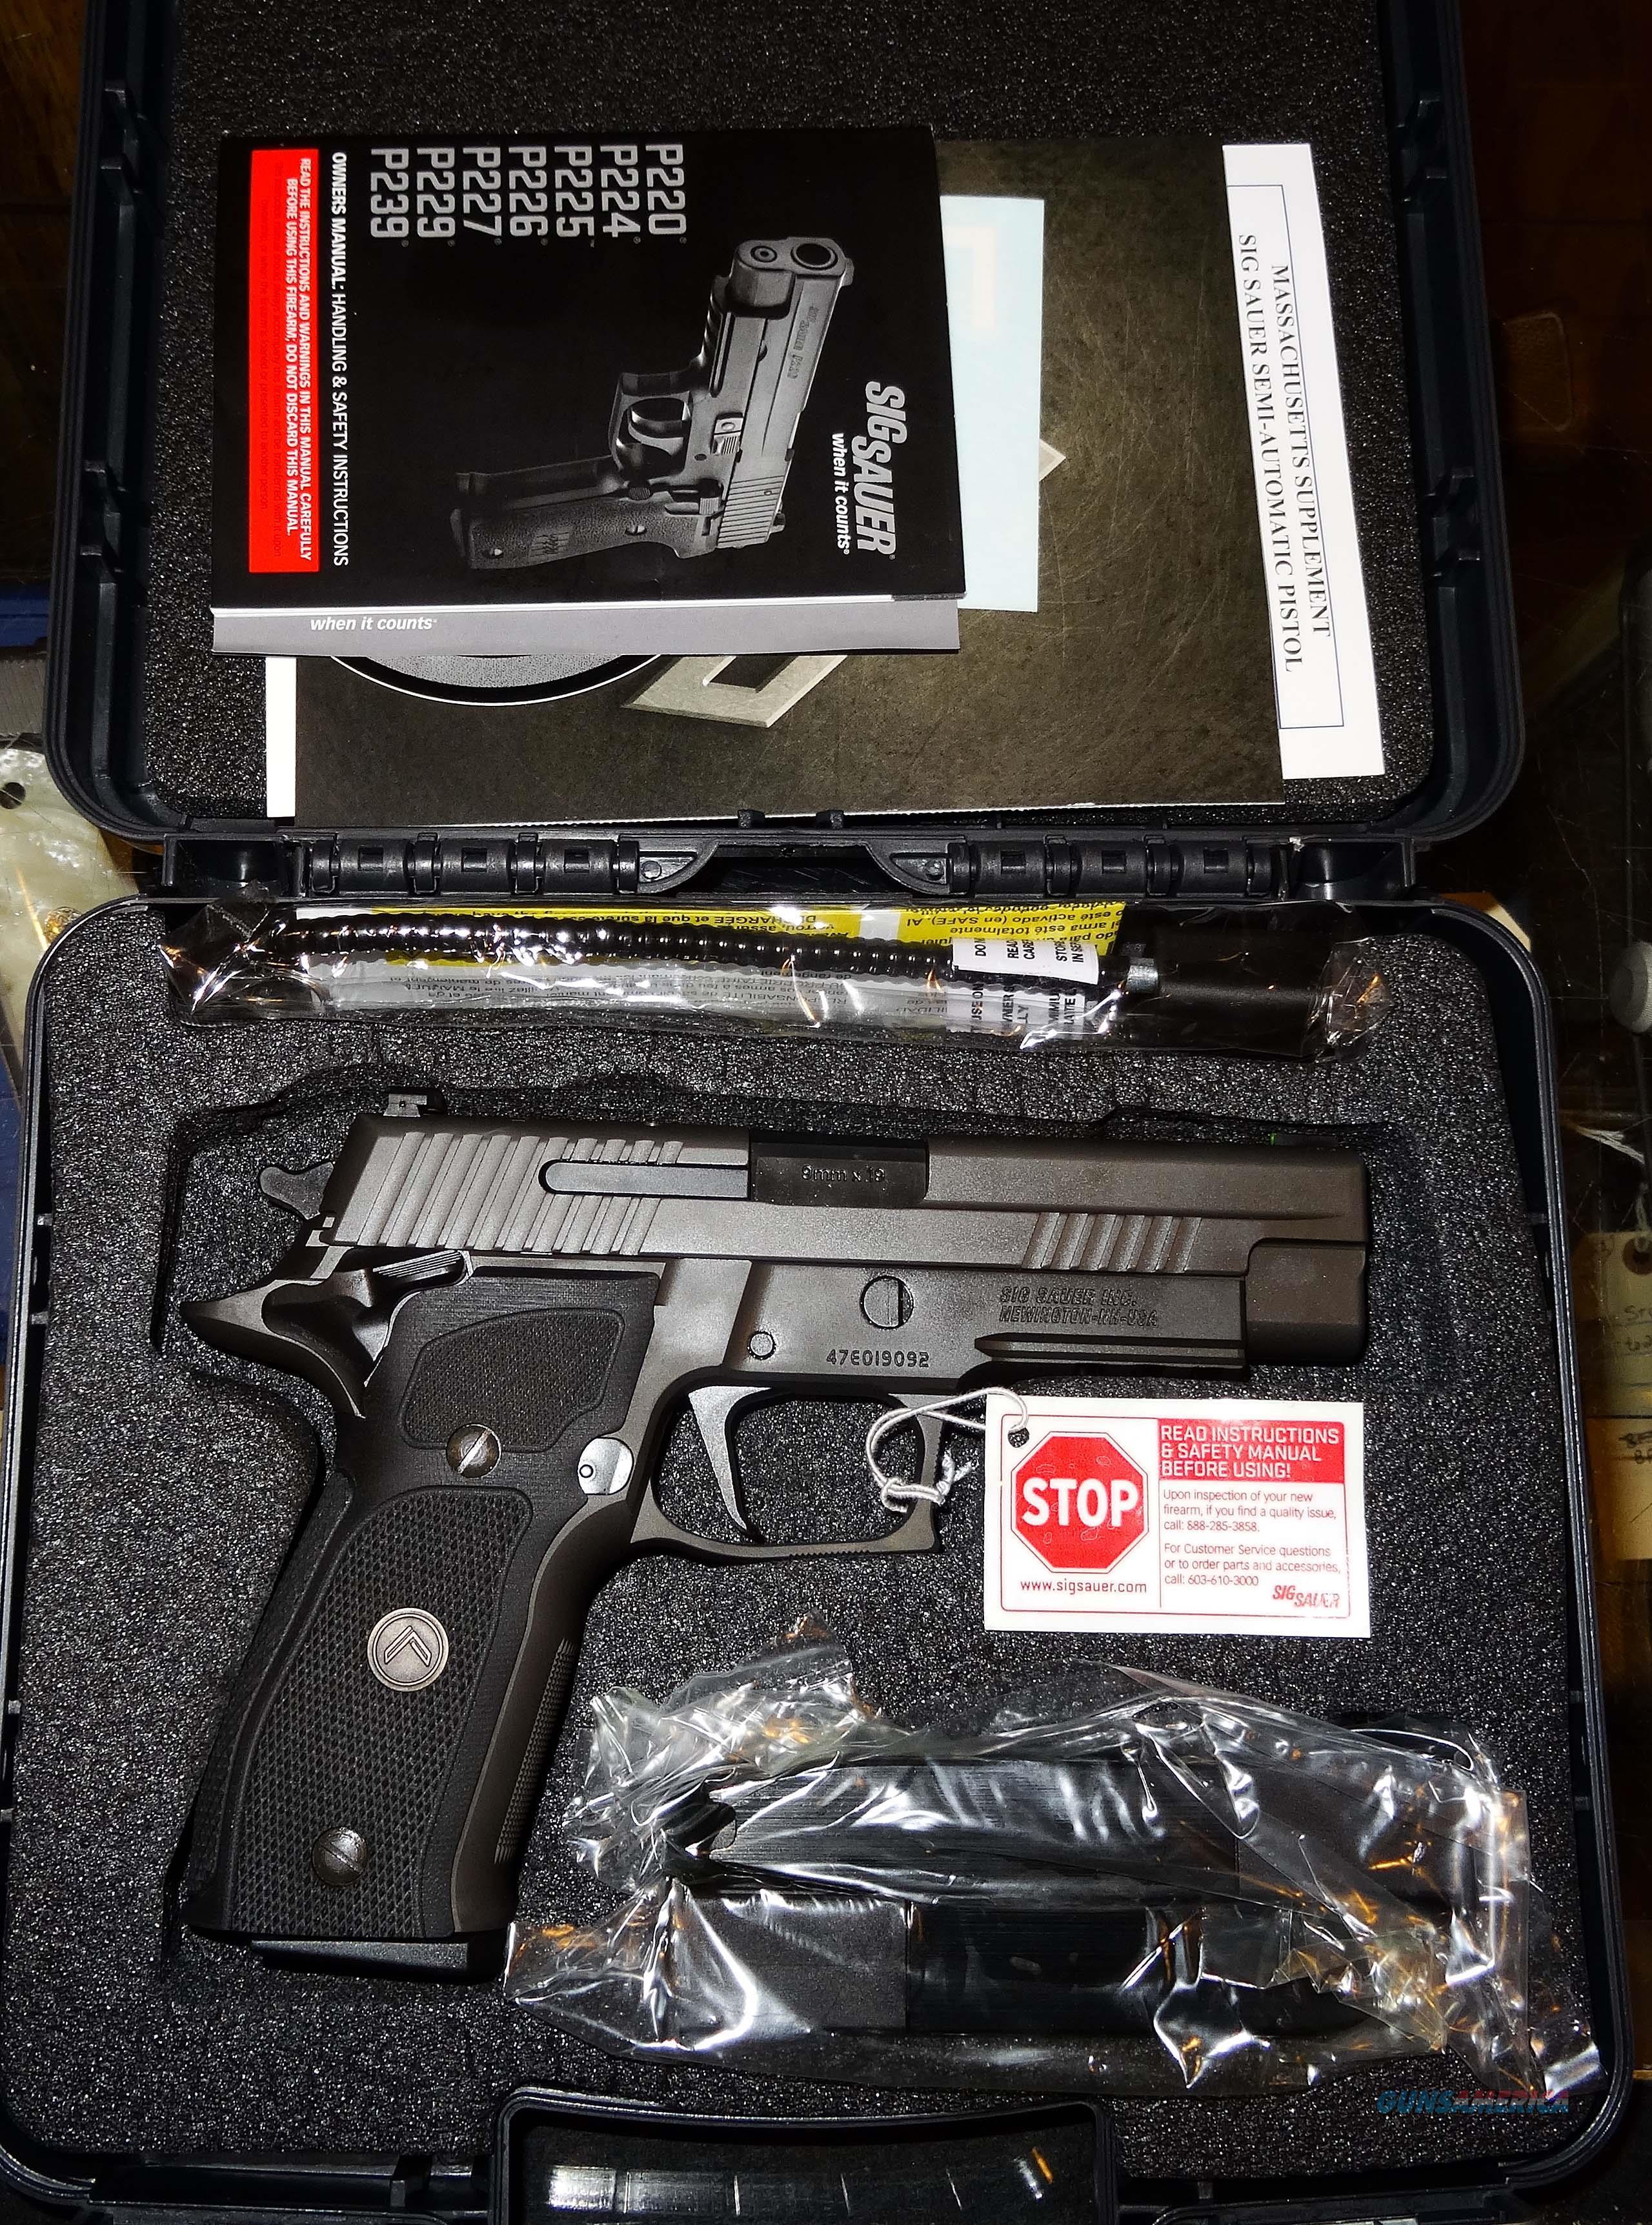 SIG SAUER P226 LEGION  Guns > Pistols > Sig - Sauer/Sigarms Pistols > P227